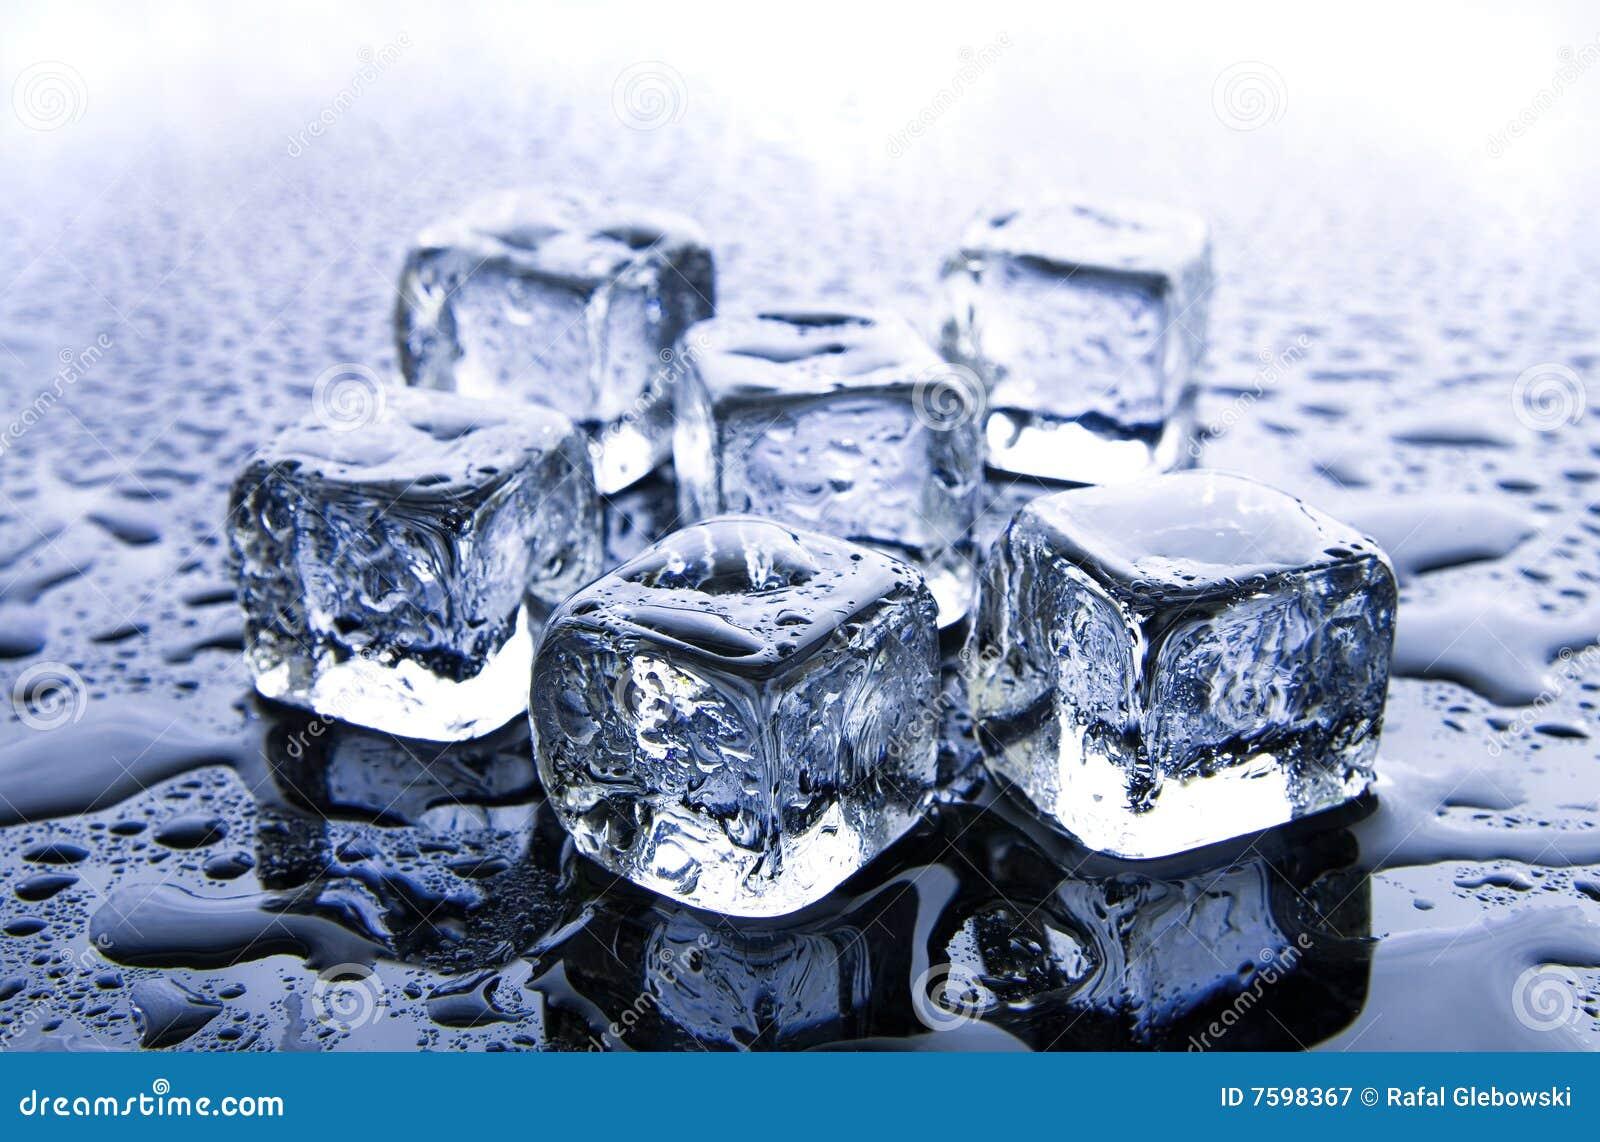 кубики морозят плавить